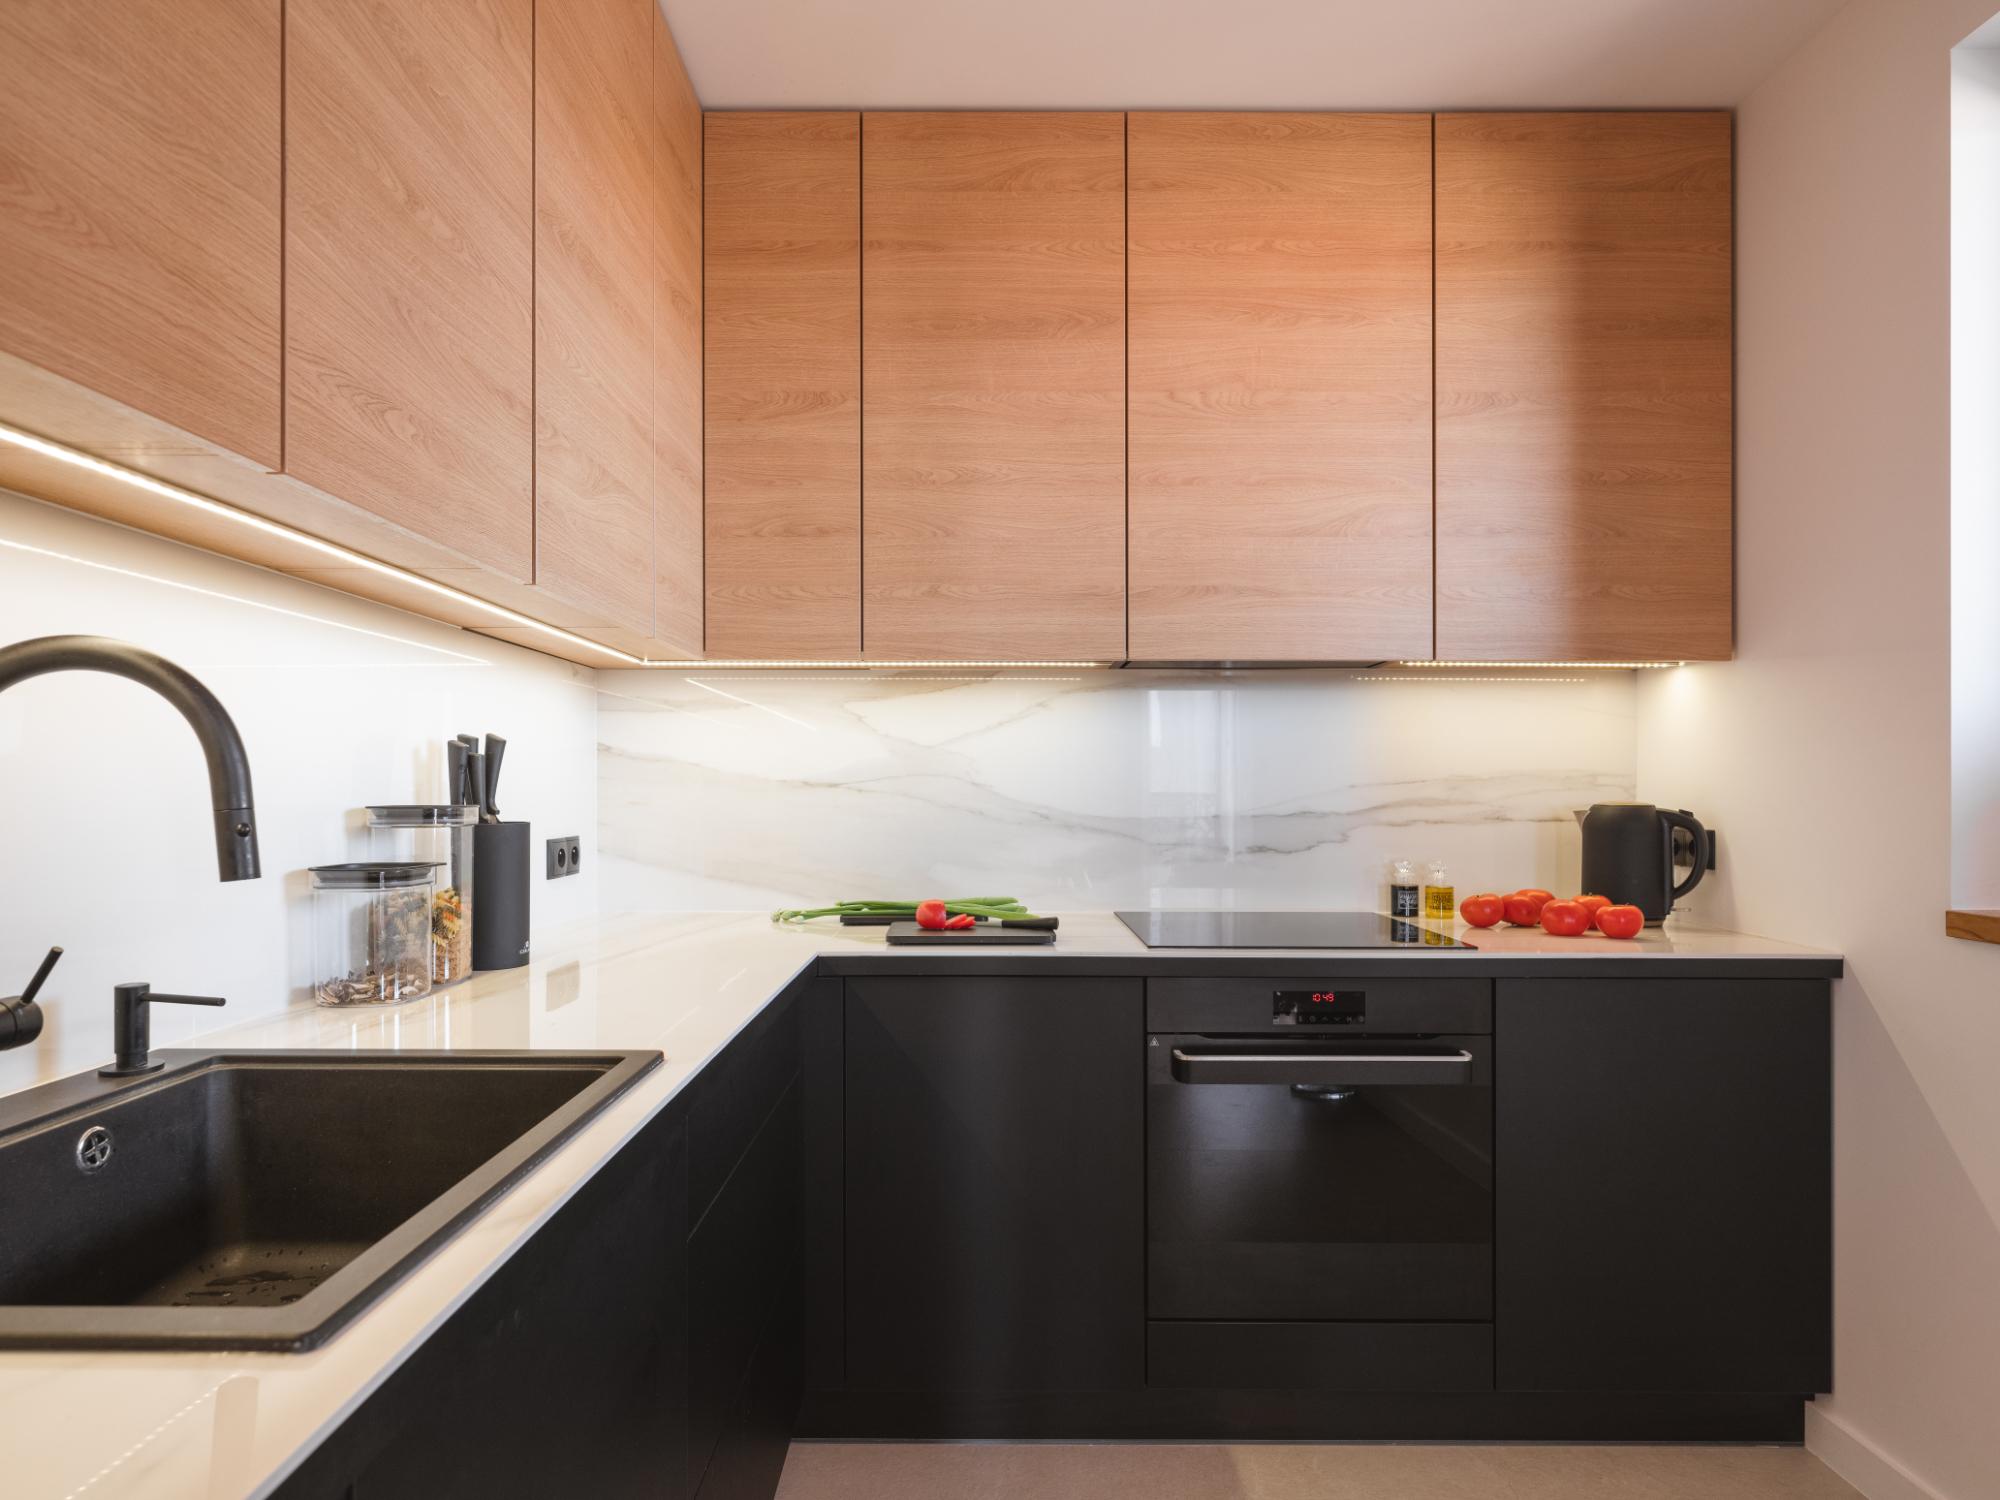 Apartment 2 / photo: Marcin Boruń